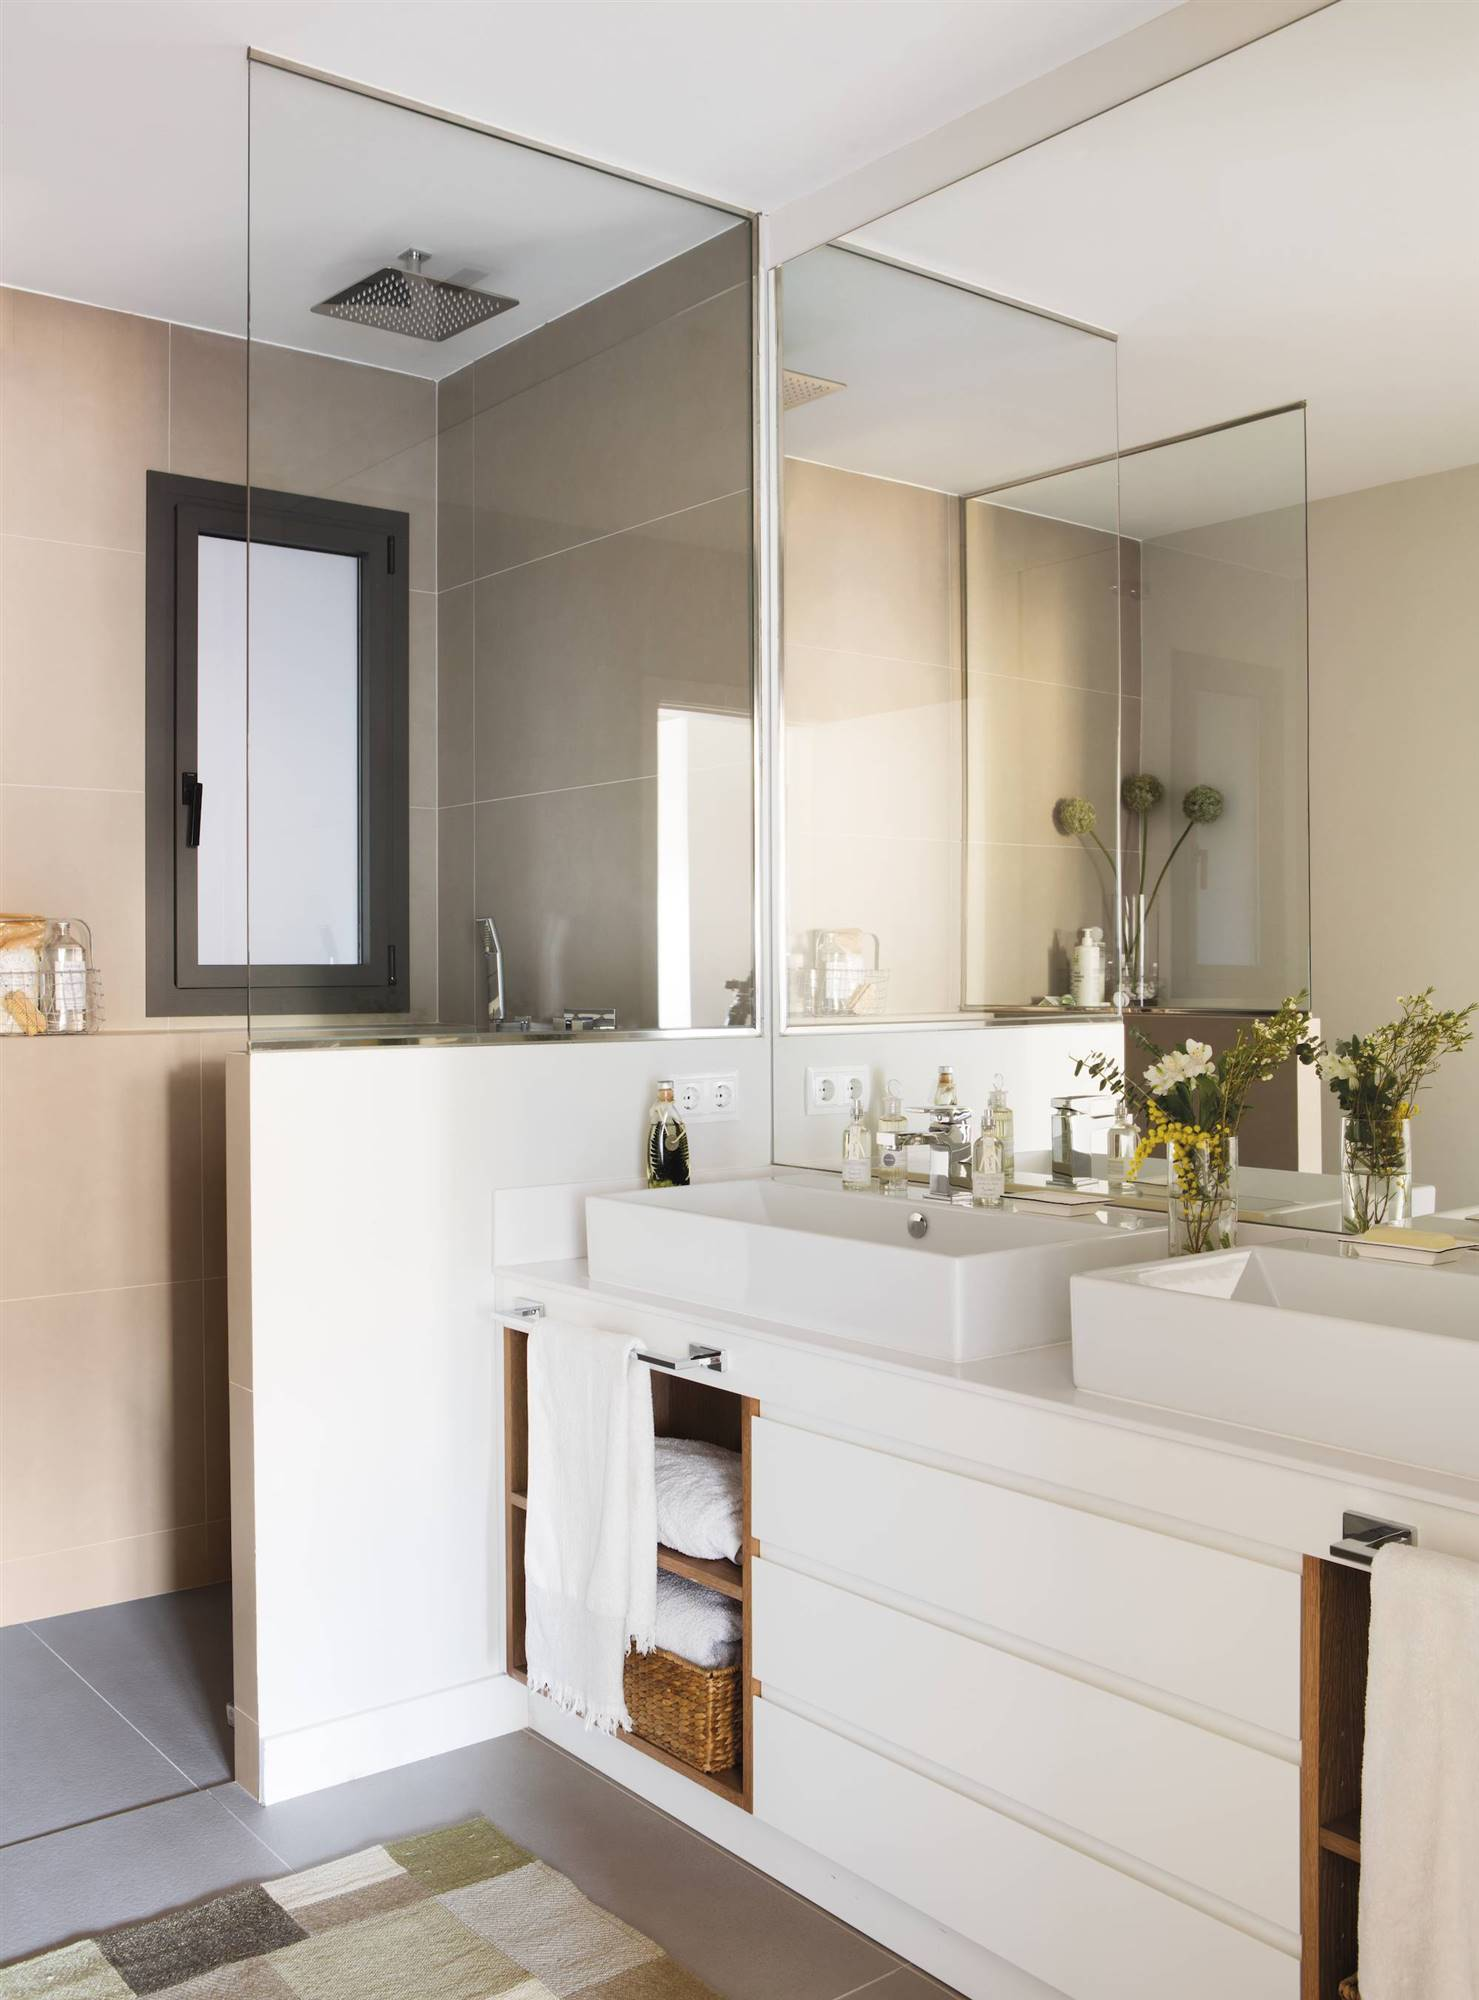 100 ideas para ba os peque os muebles peque as reformas for Muebles para cuarto de bano pequeno